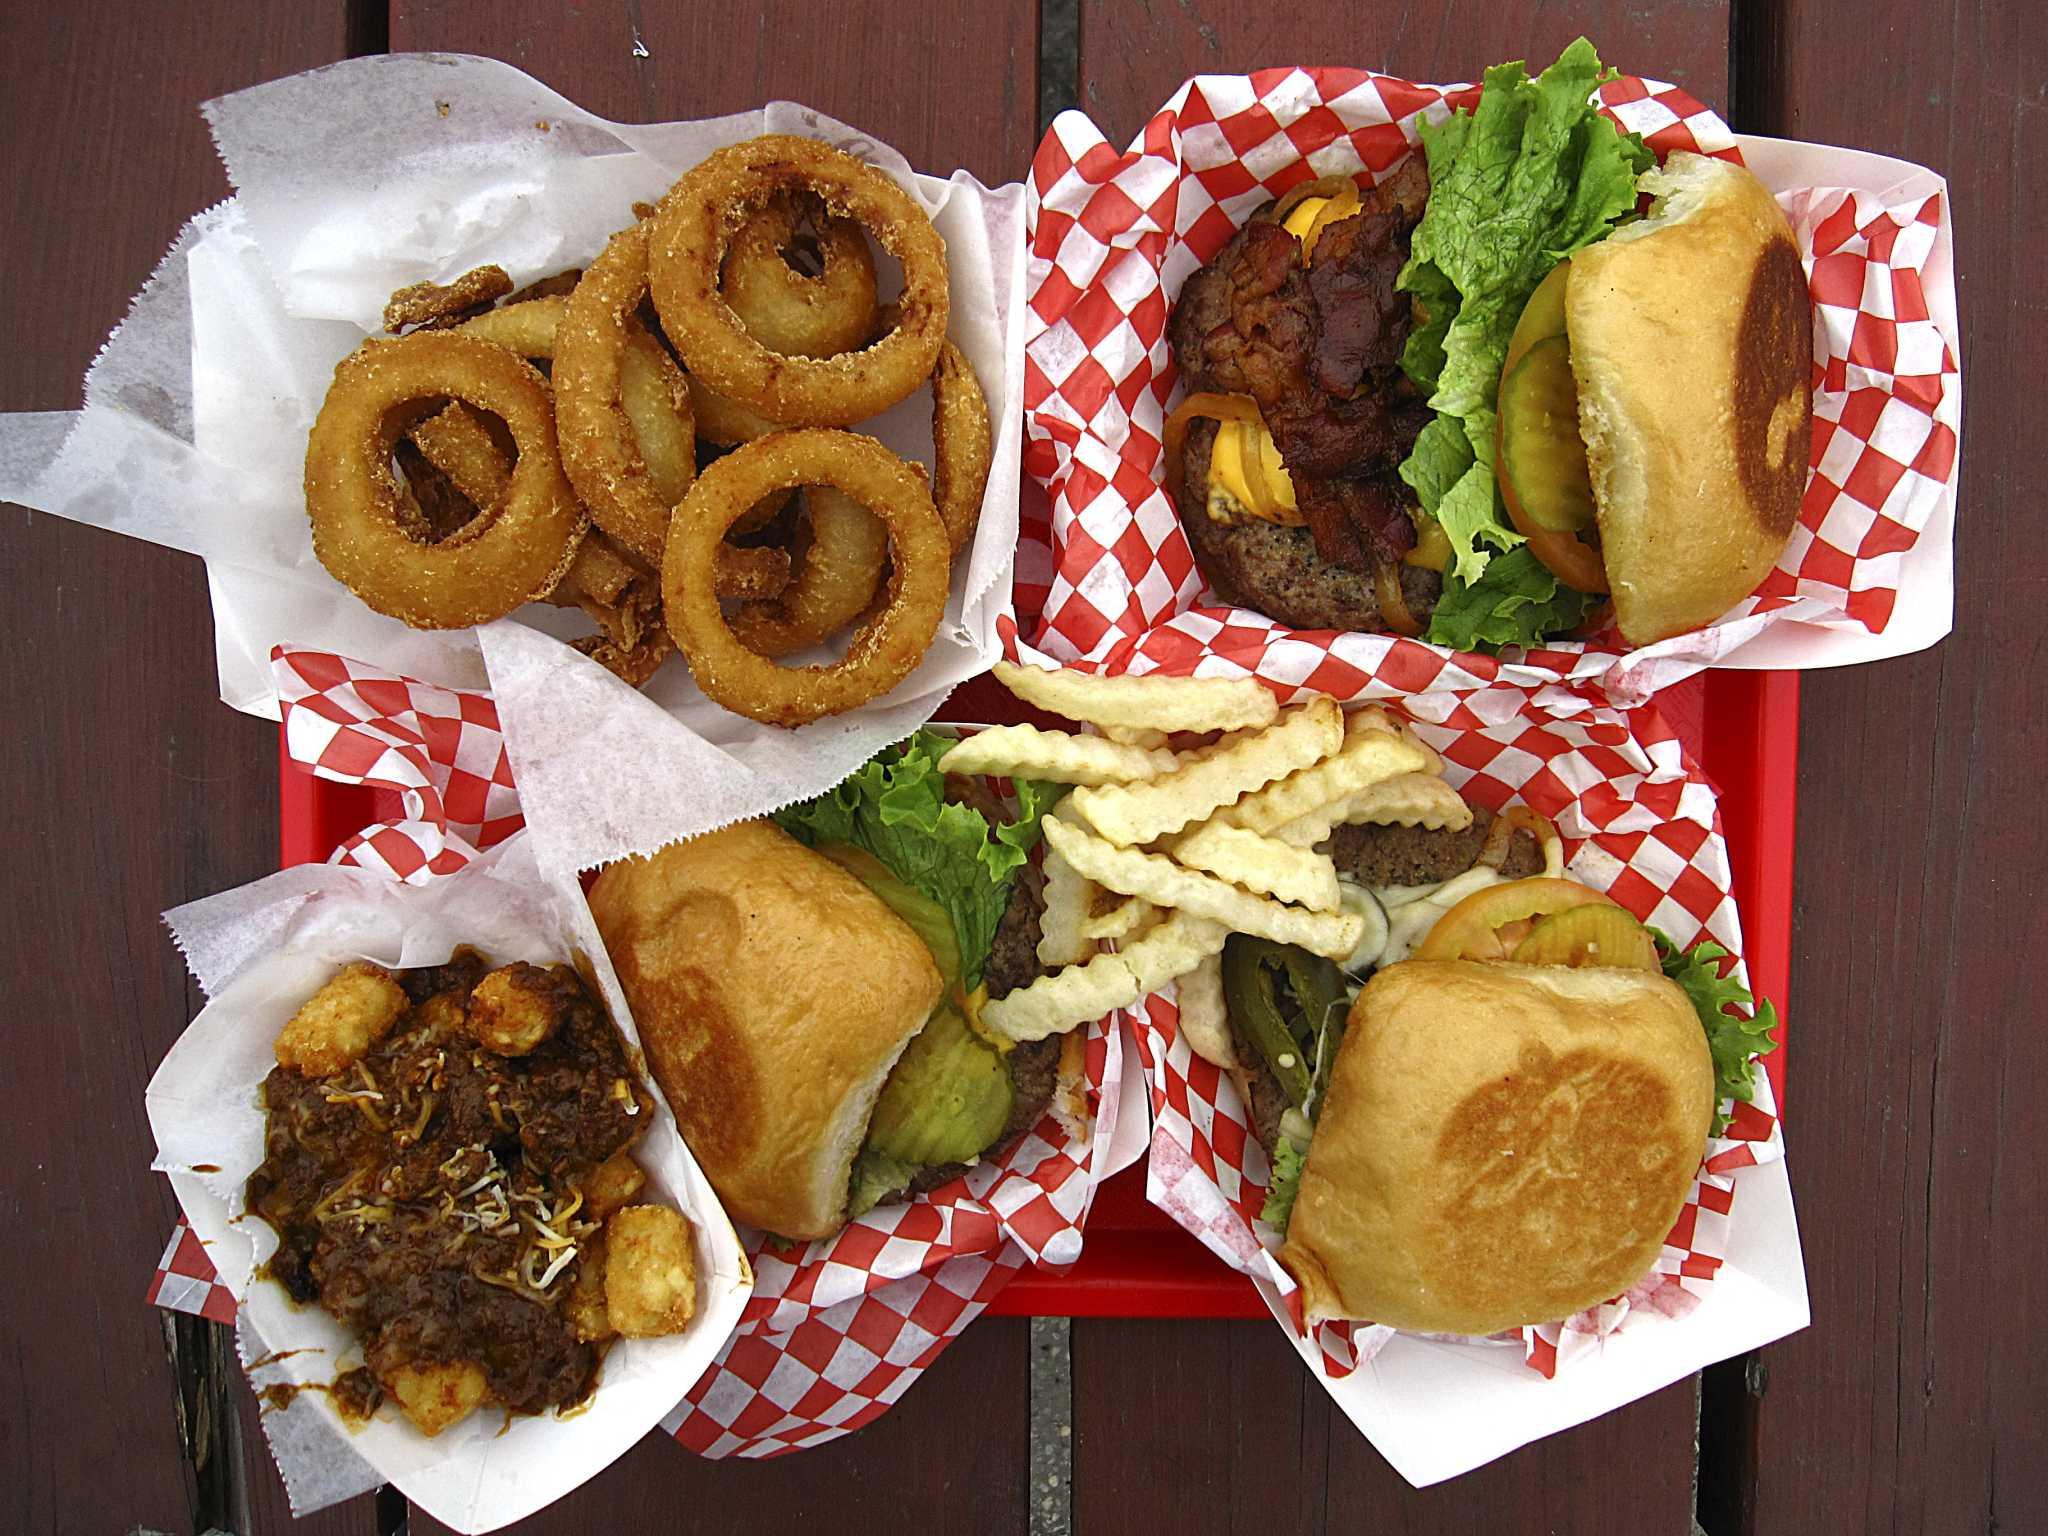 San Antonio: Papa's Burgers is back on the West Side